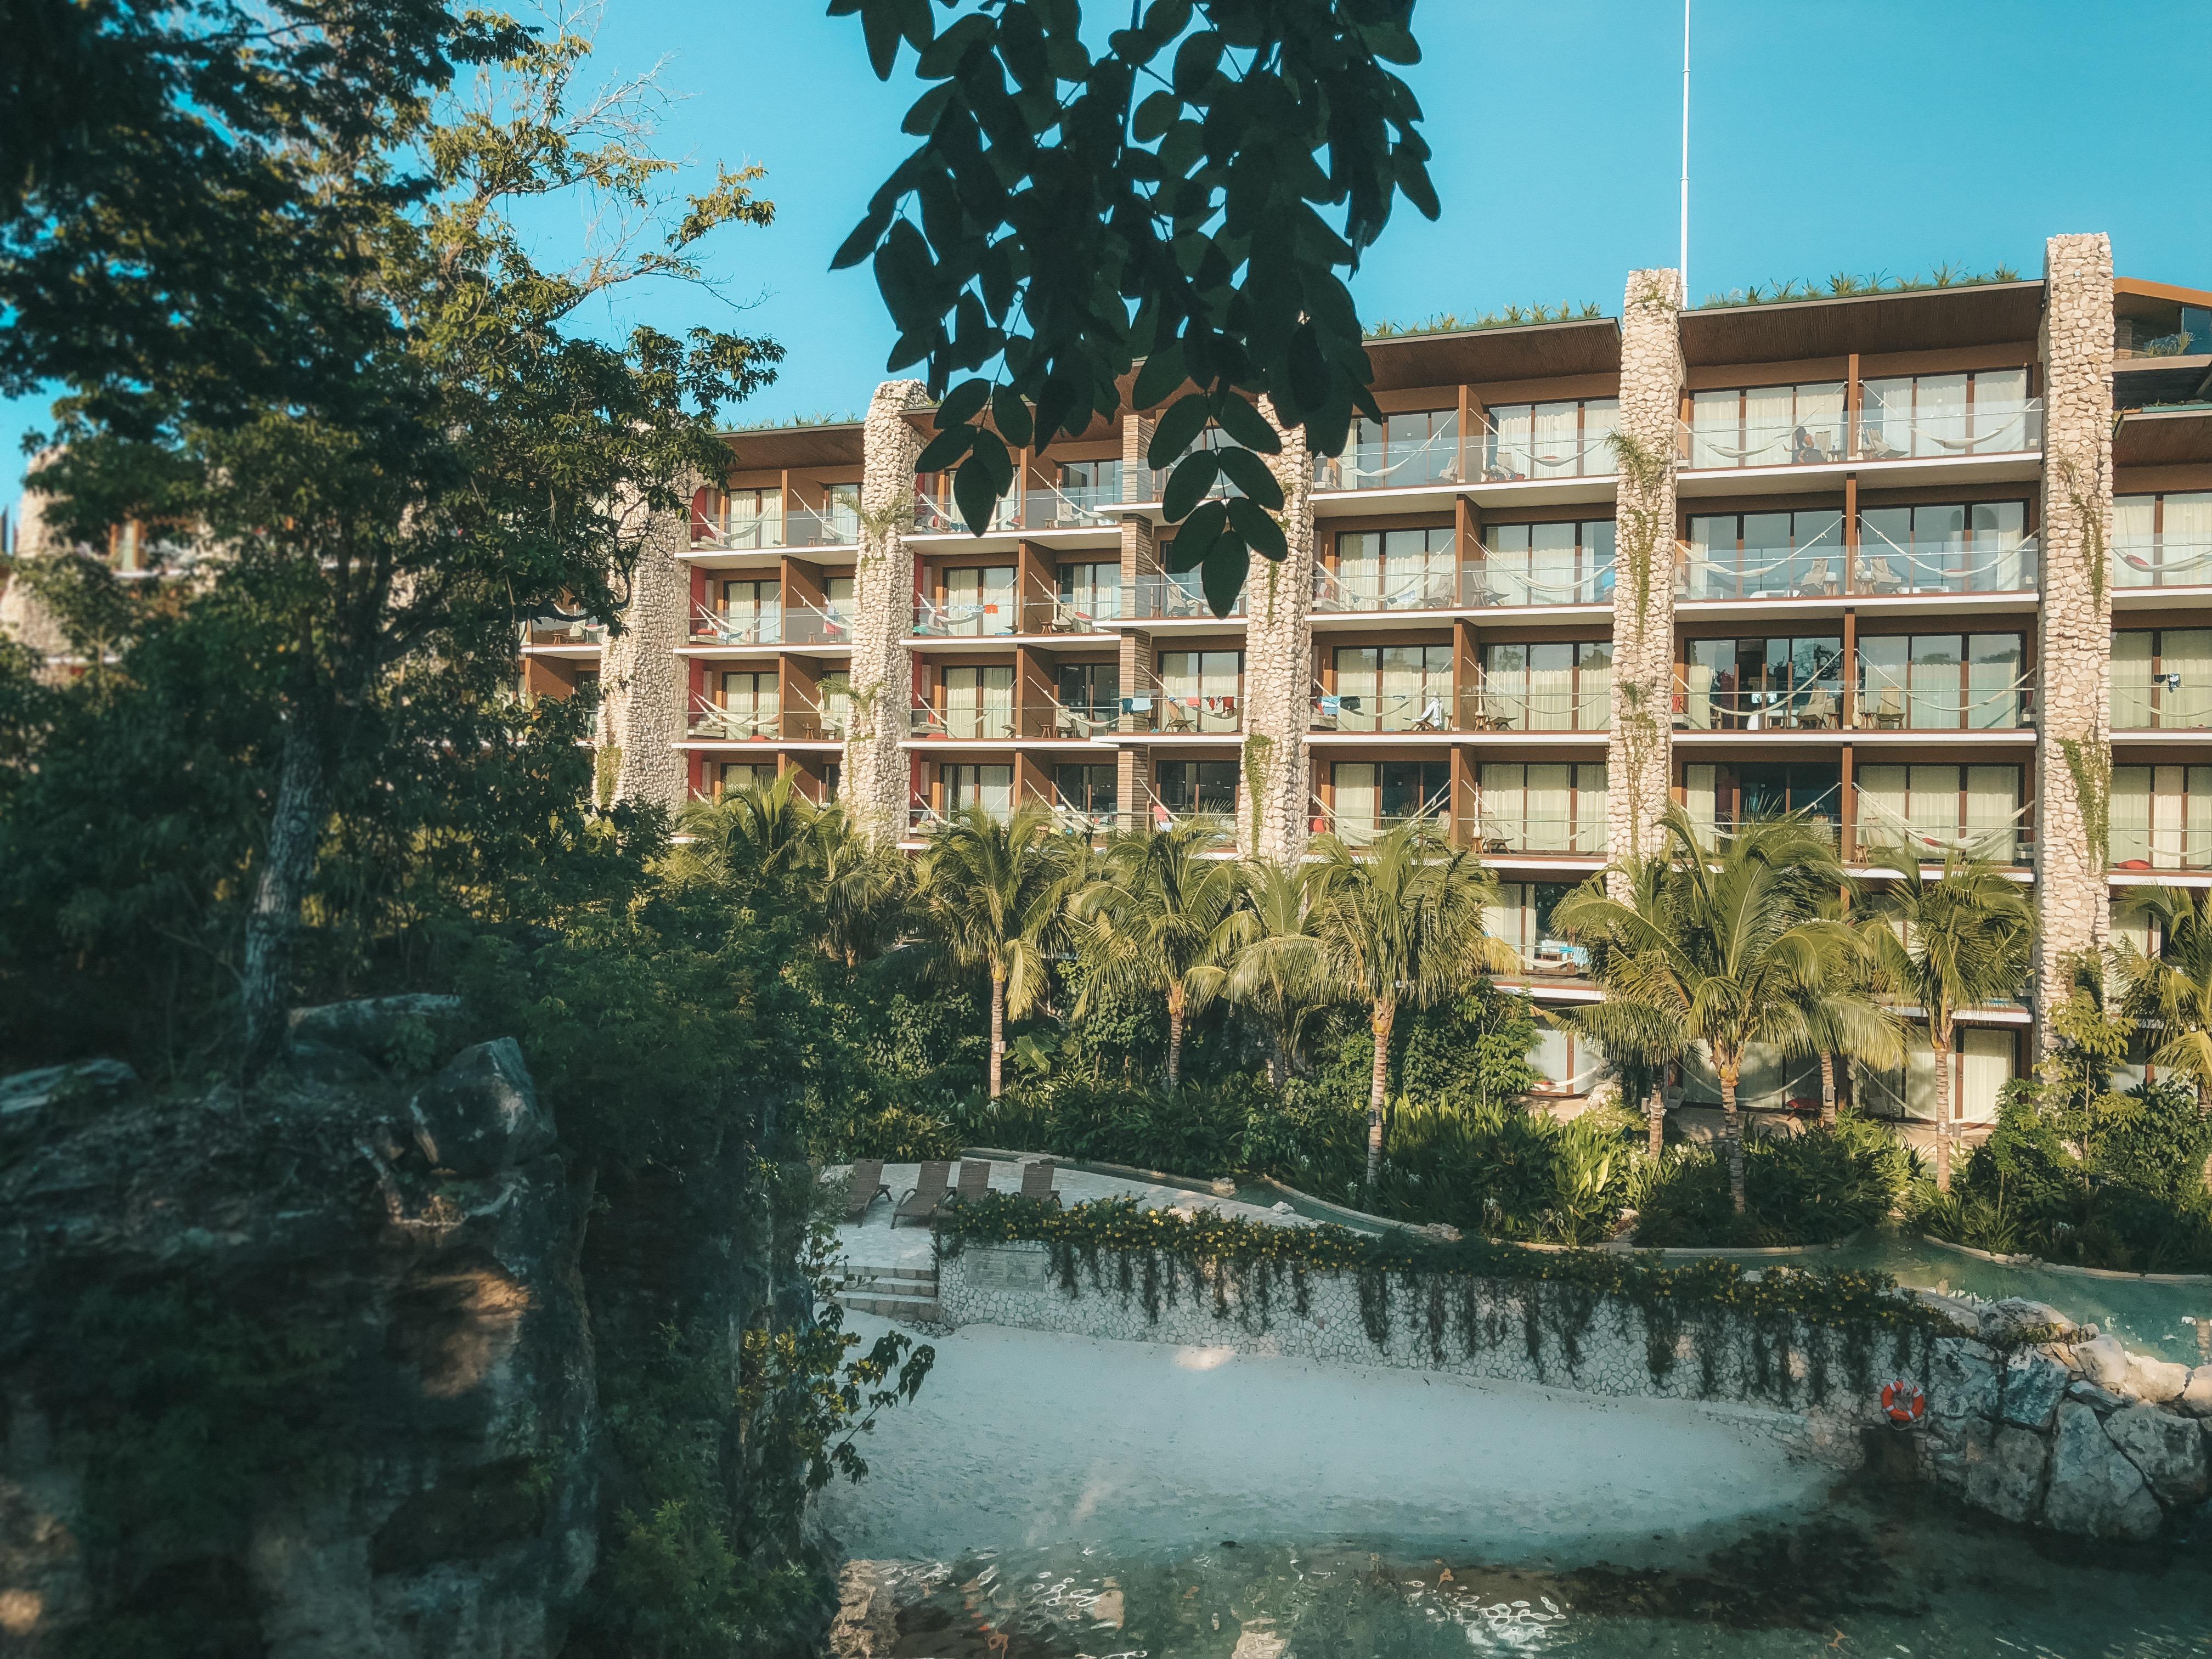 Hotel Xcaret México (Foto: Tati Sisti)